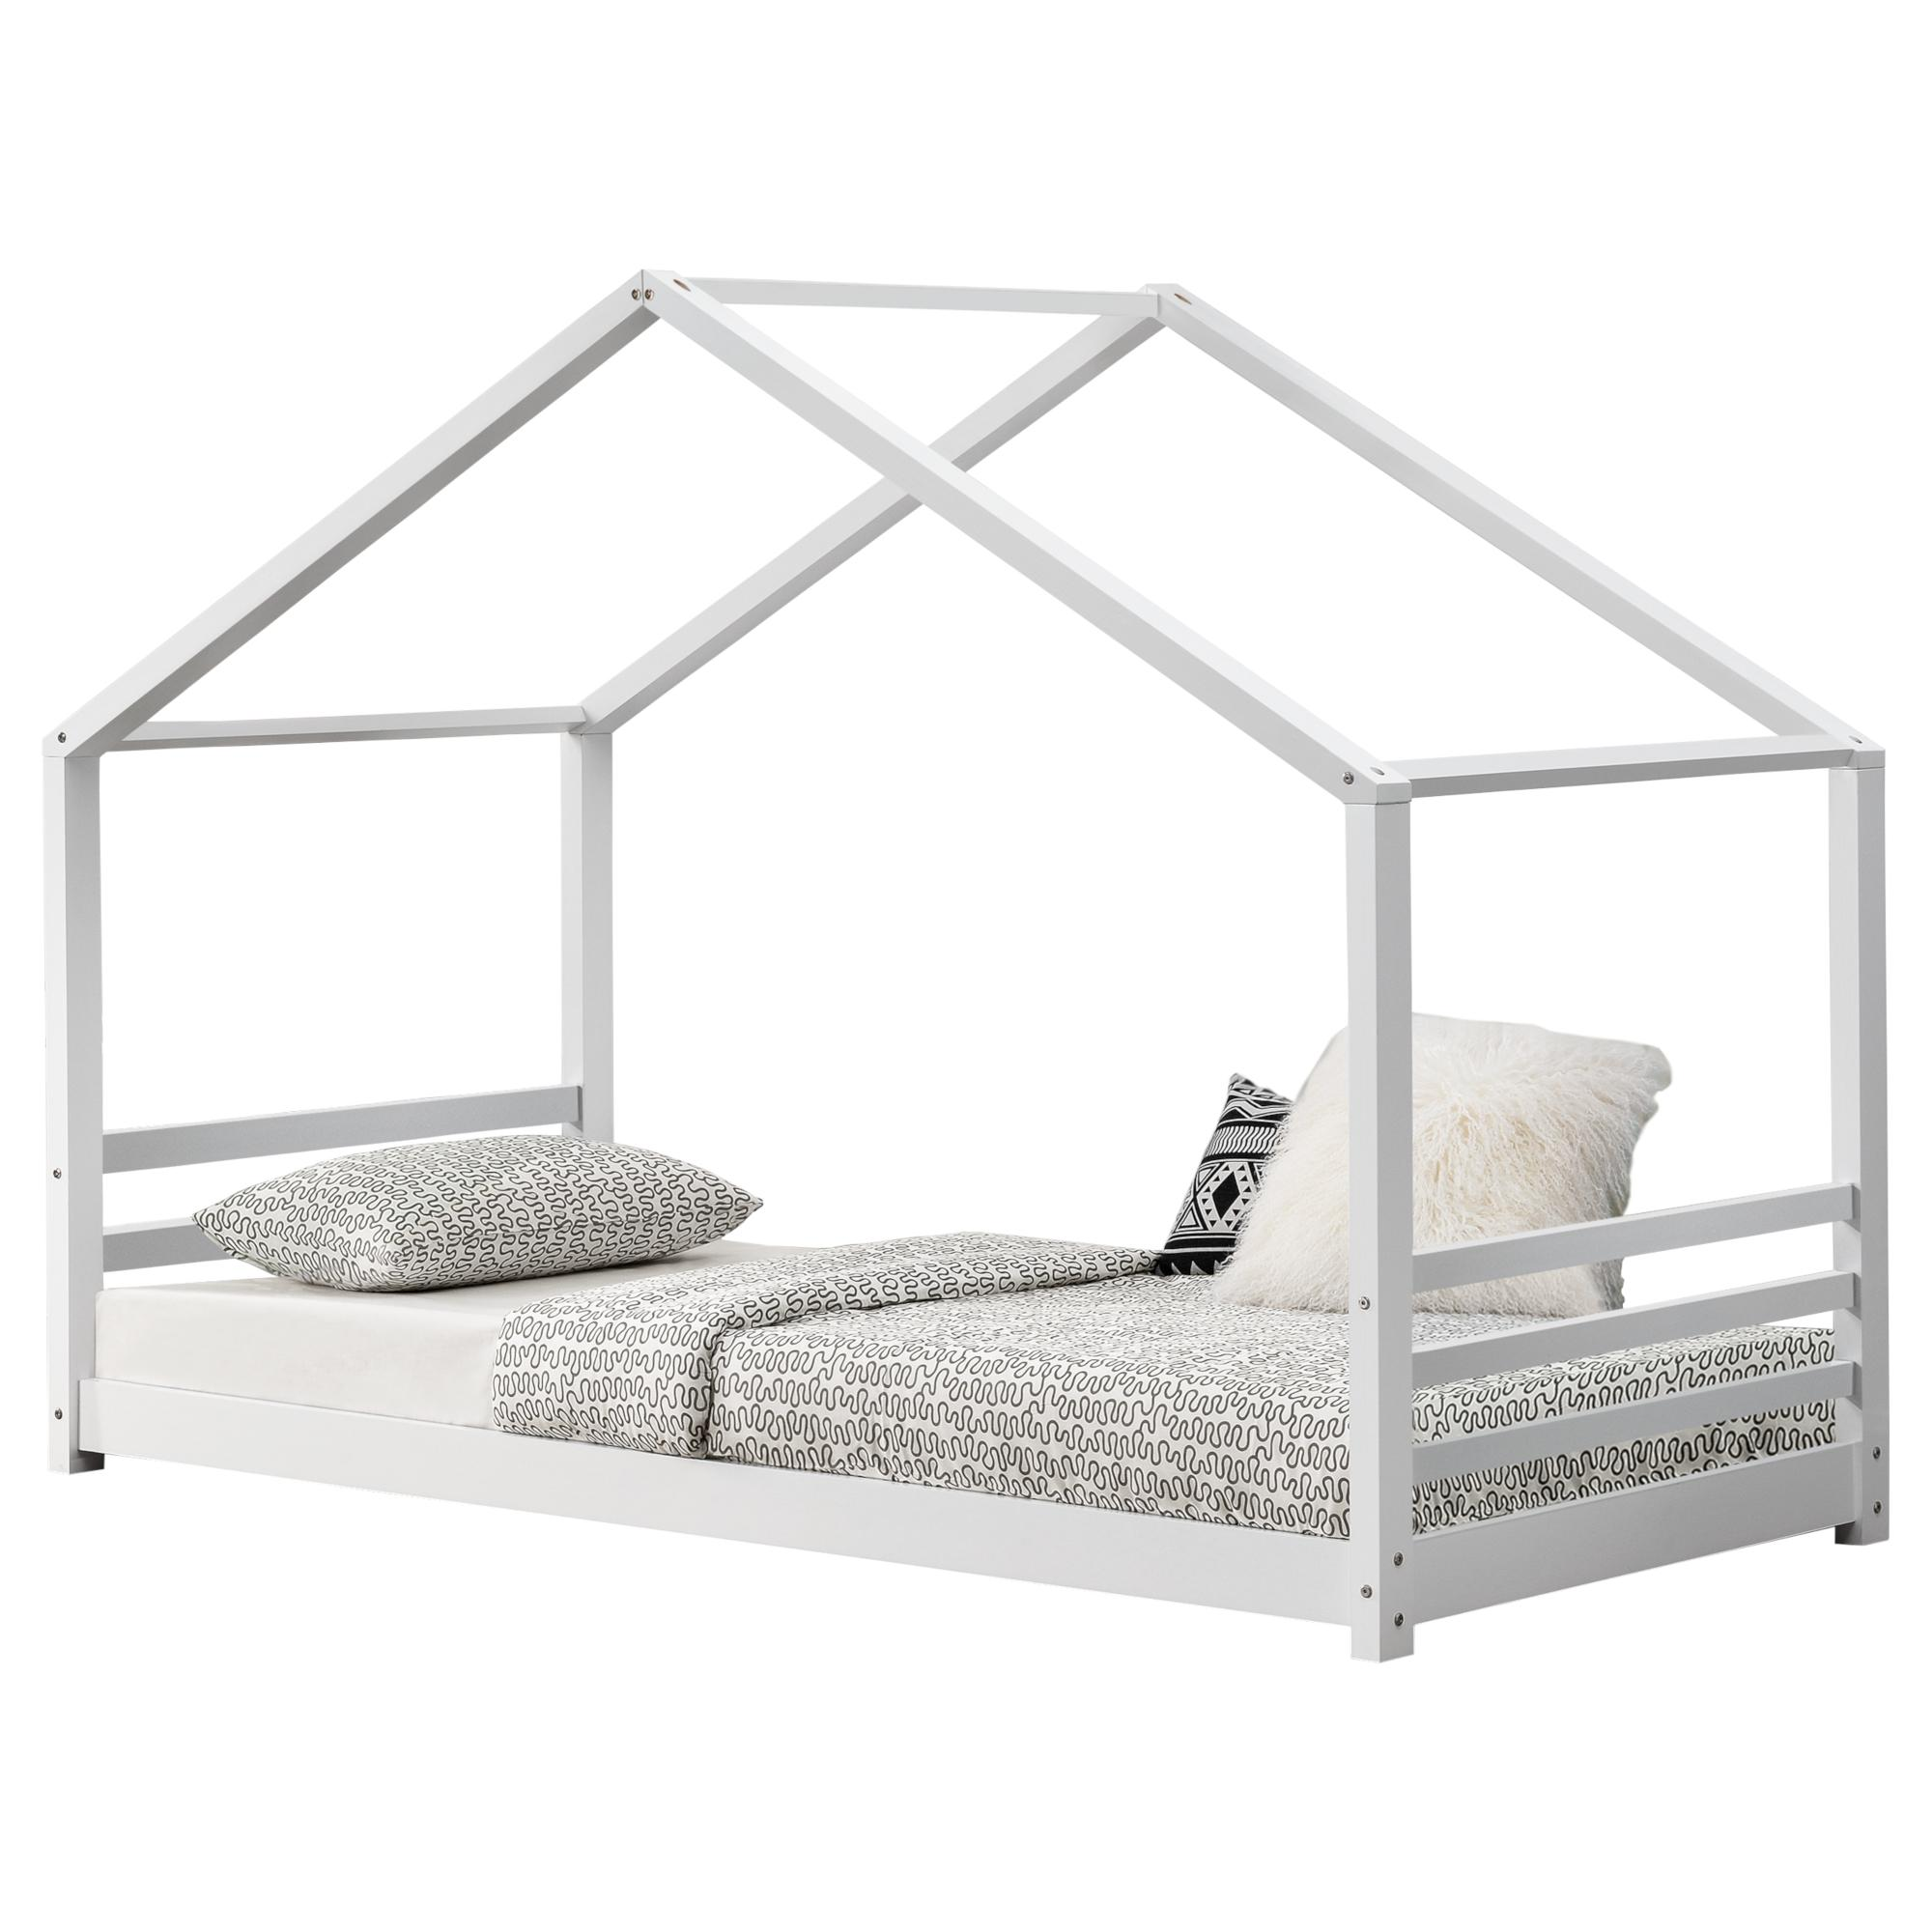 [en.casa] Detská posteľ AAKB-8693 biela 90x200 cm